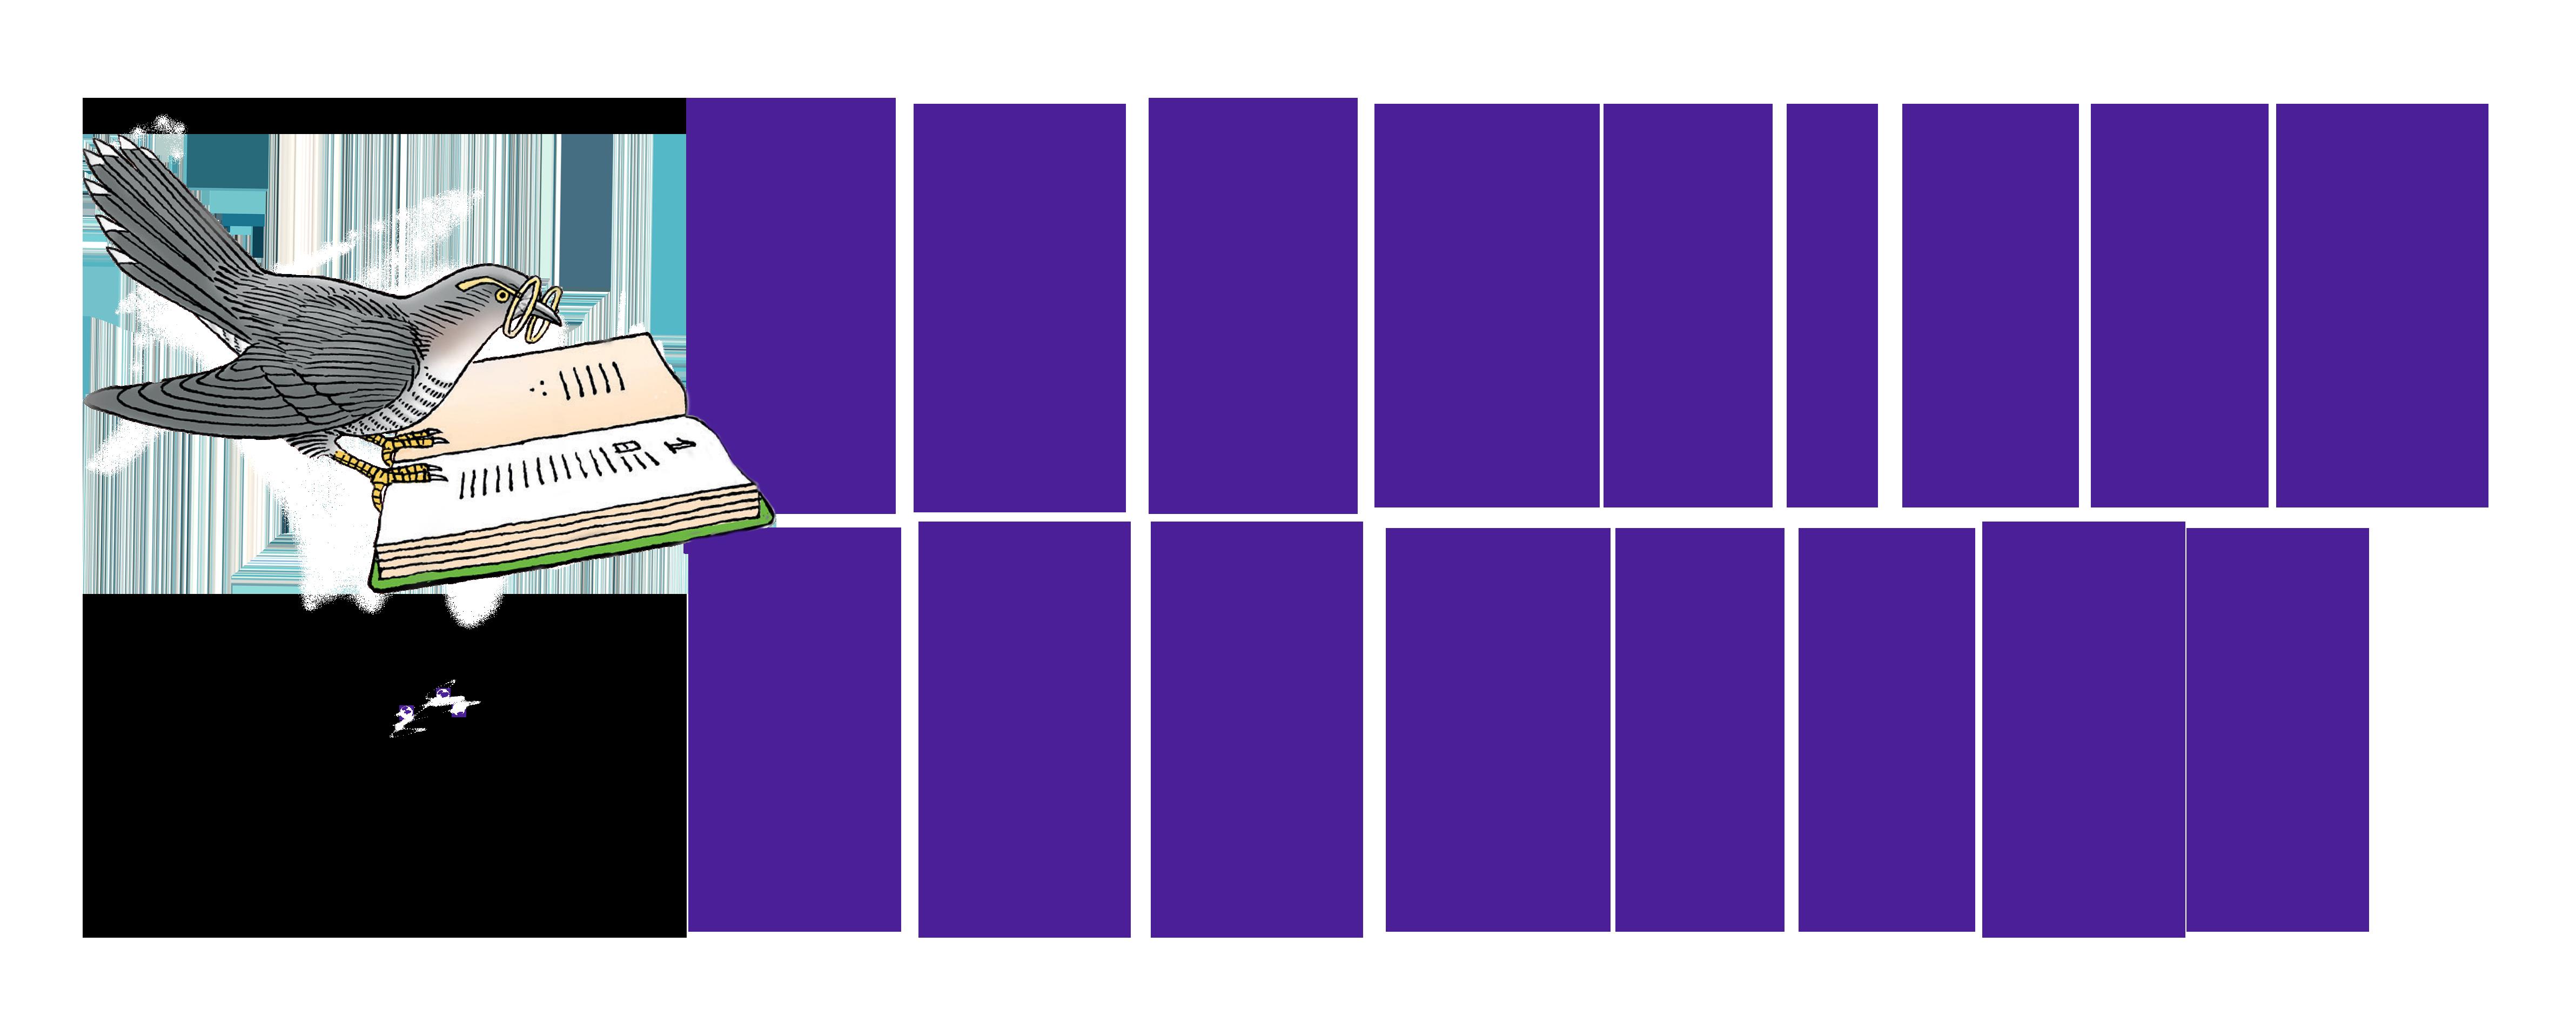 Cuckfield Book Festival